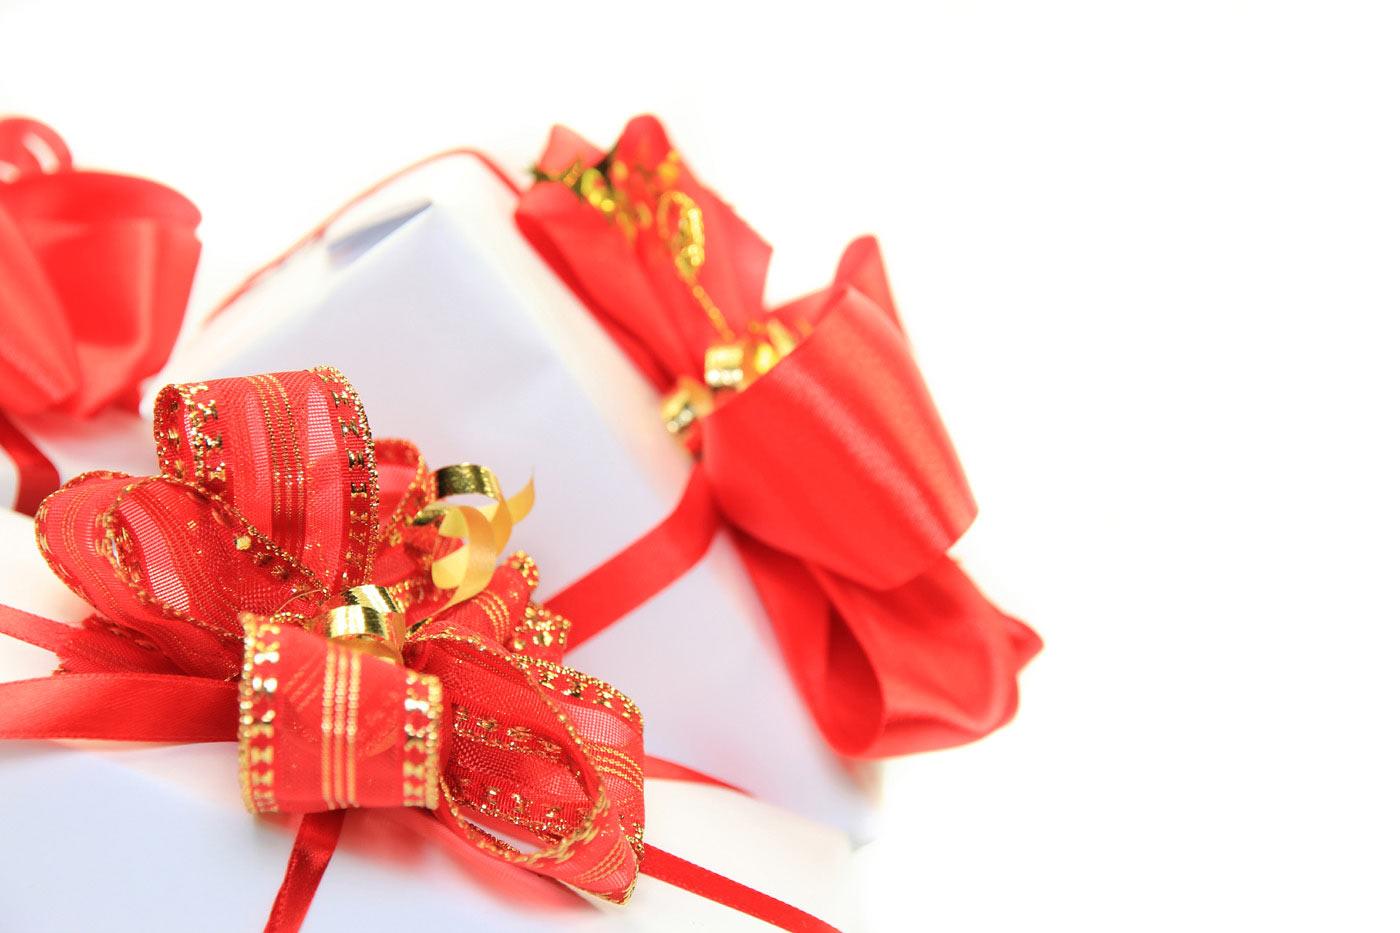 Sfondi Natale - Sfondo Natale regali